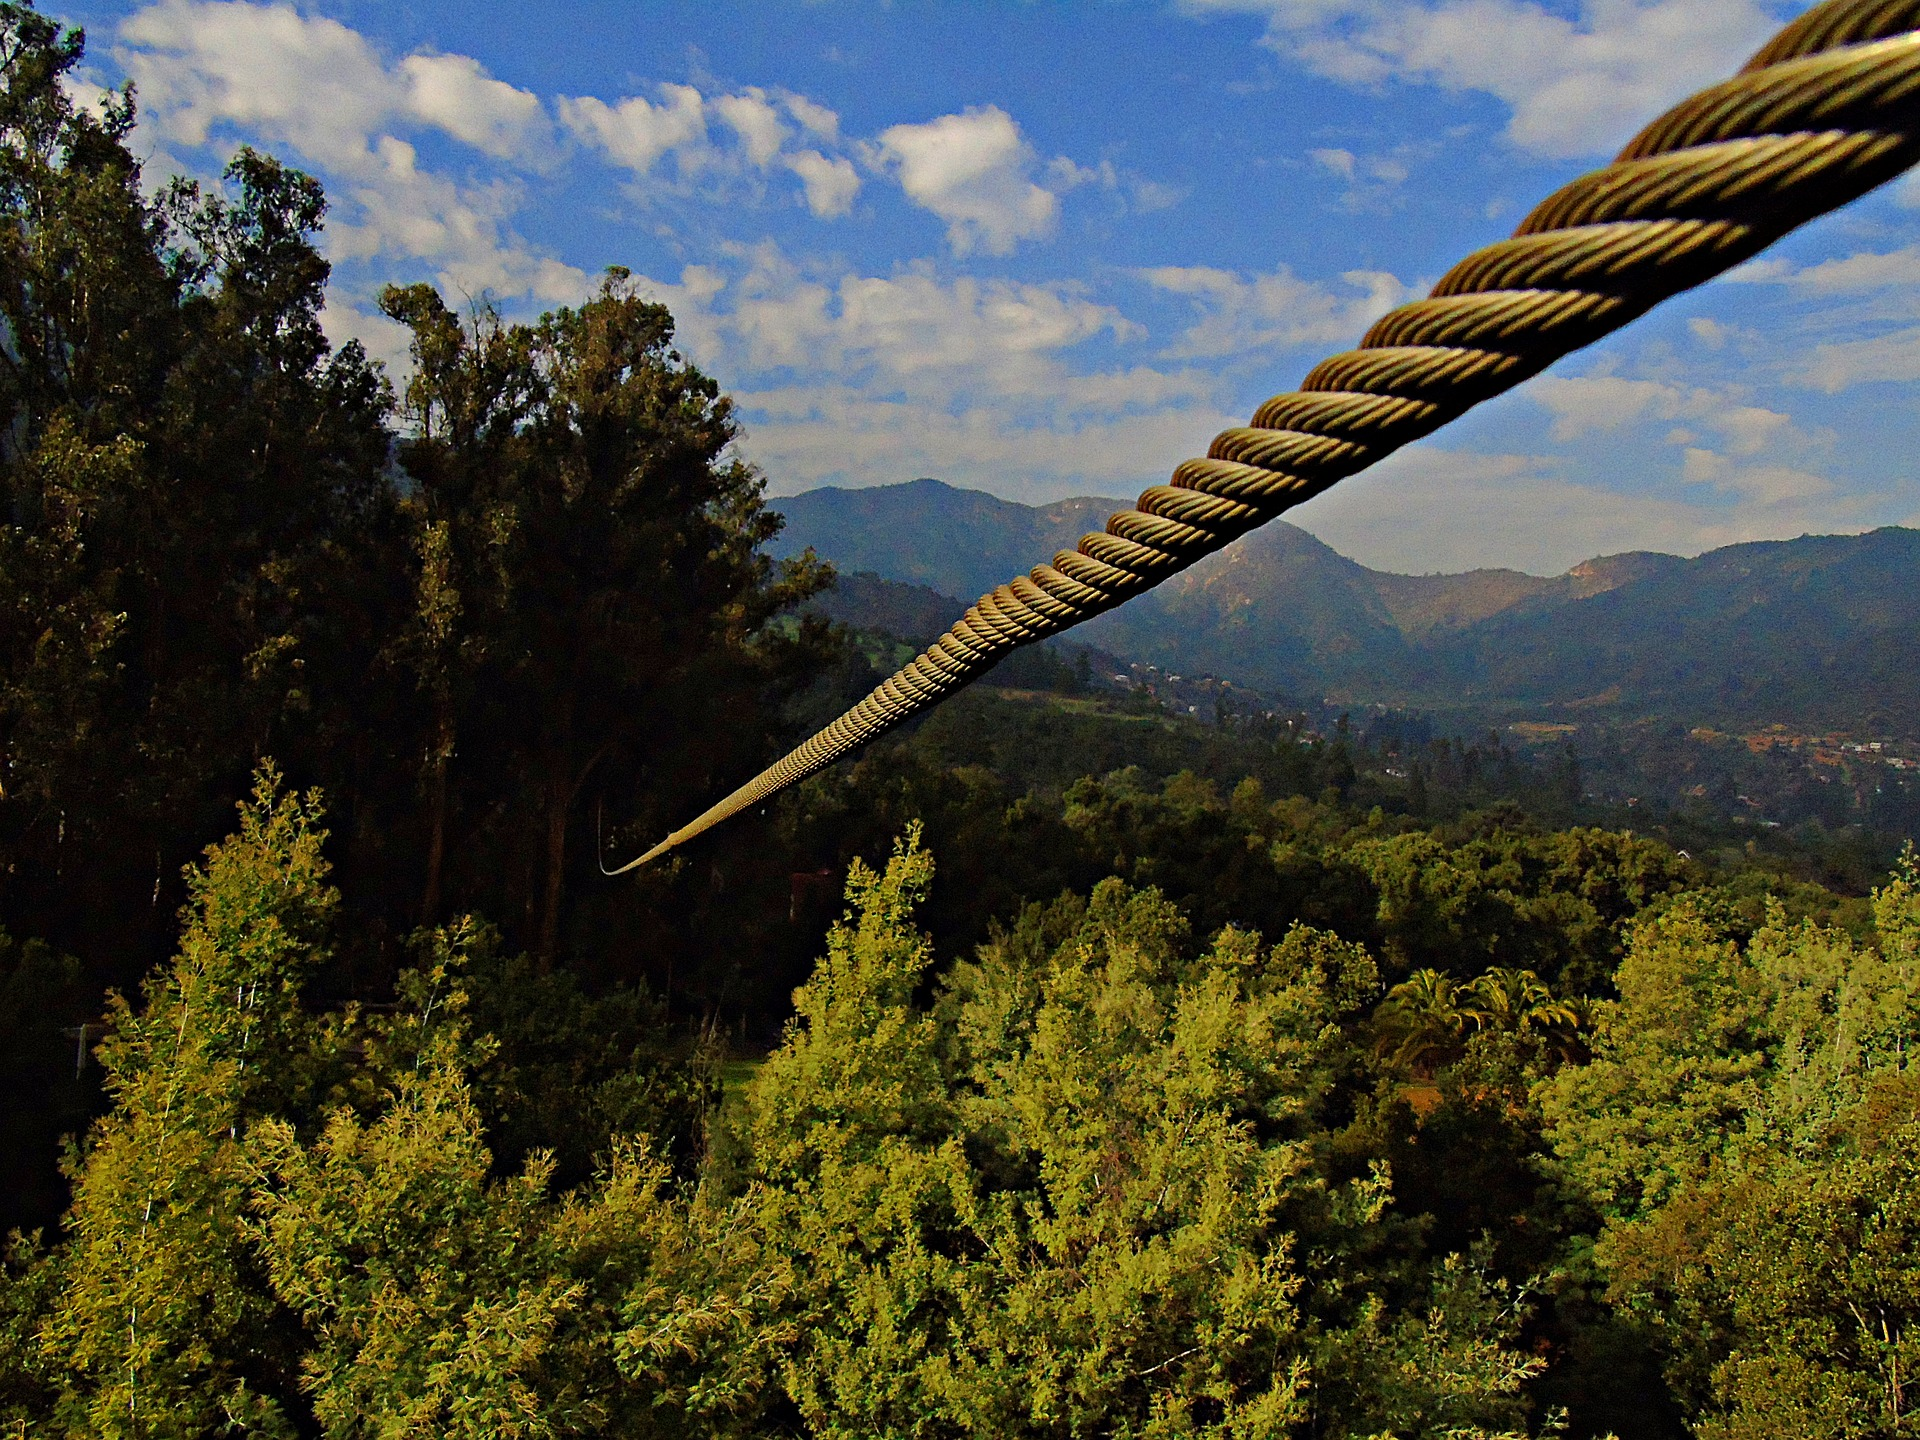 Adventurous pre-wedding activities Ziplining fun in Spain's Malaga